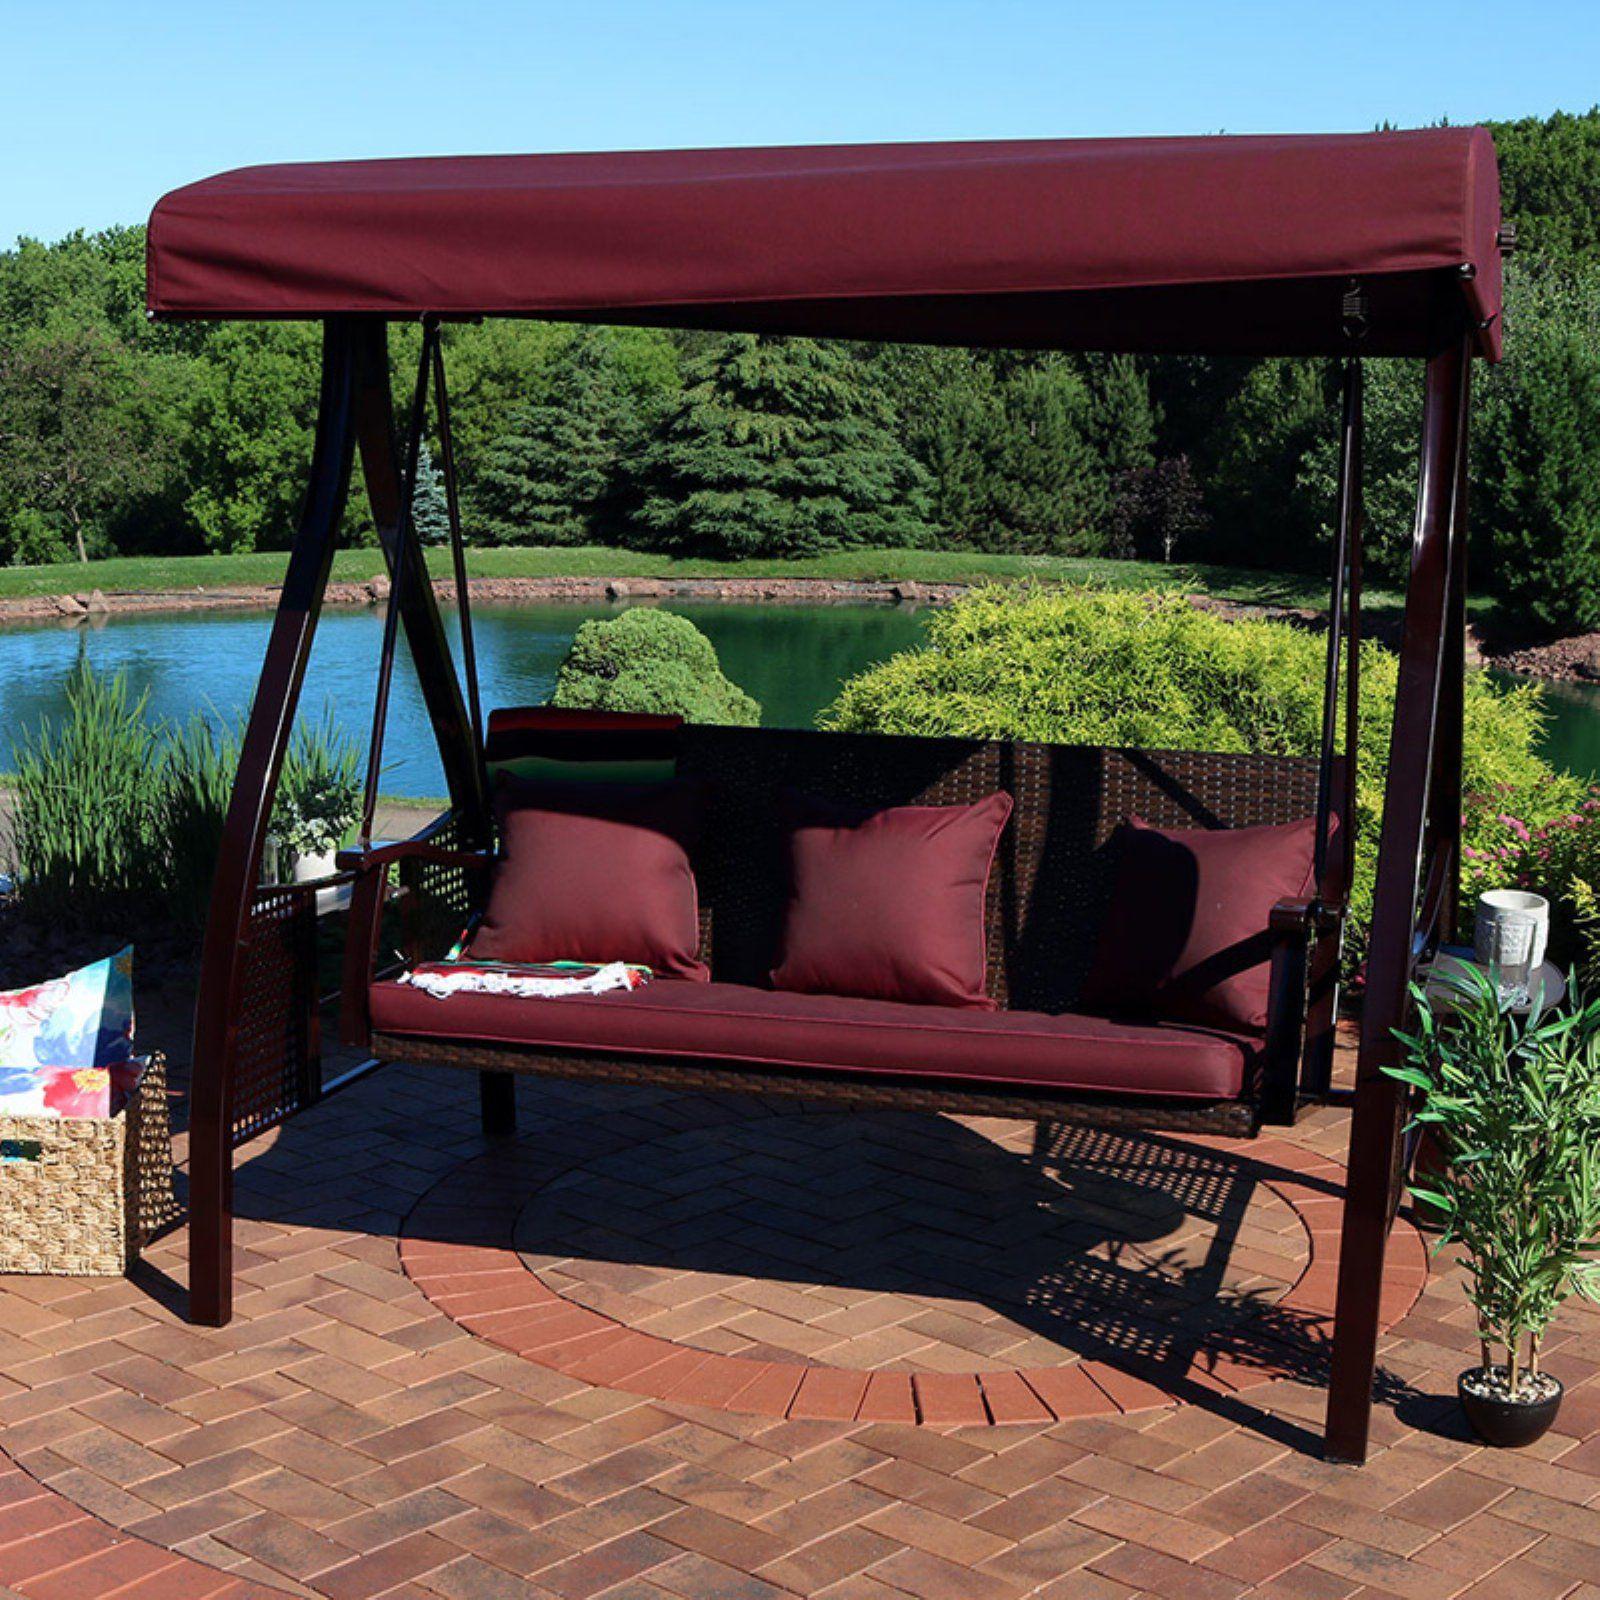 Sunnydaze Decor Deluxe Steel Frame Cushioned Canopy Swing